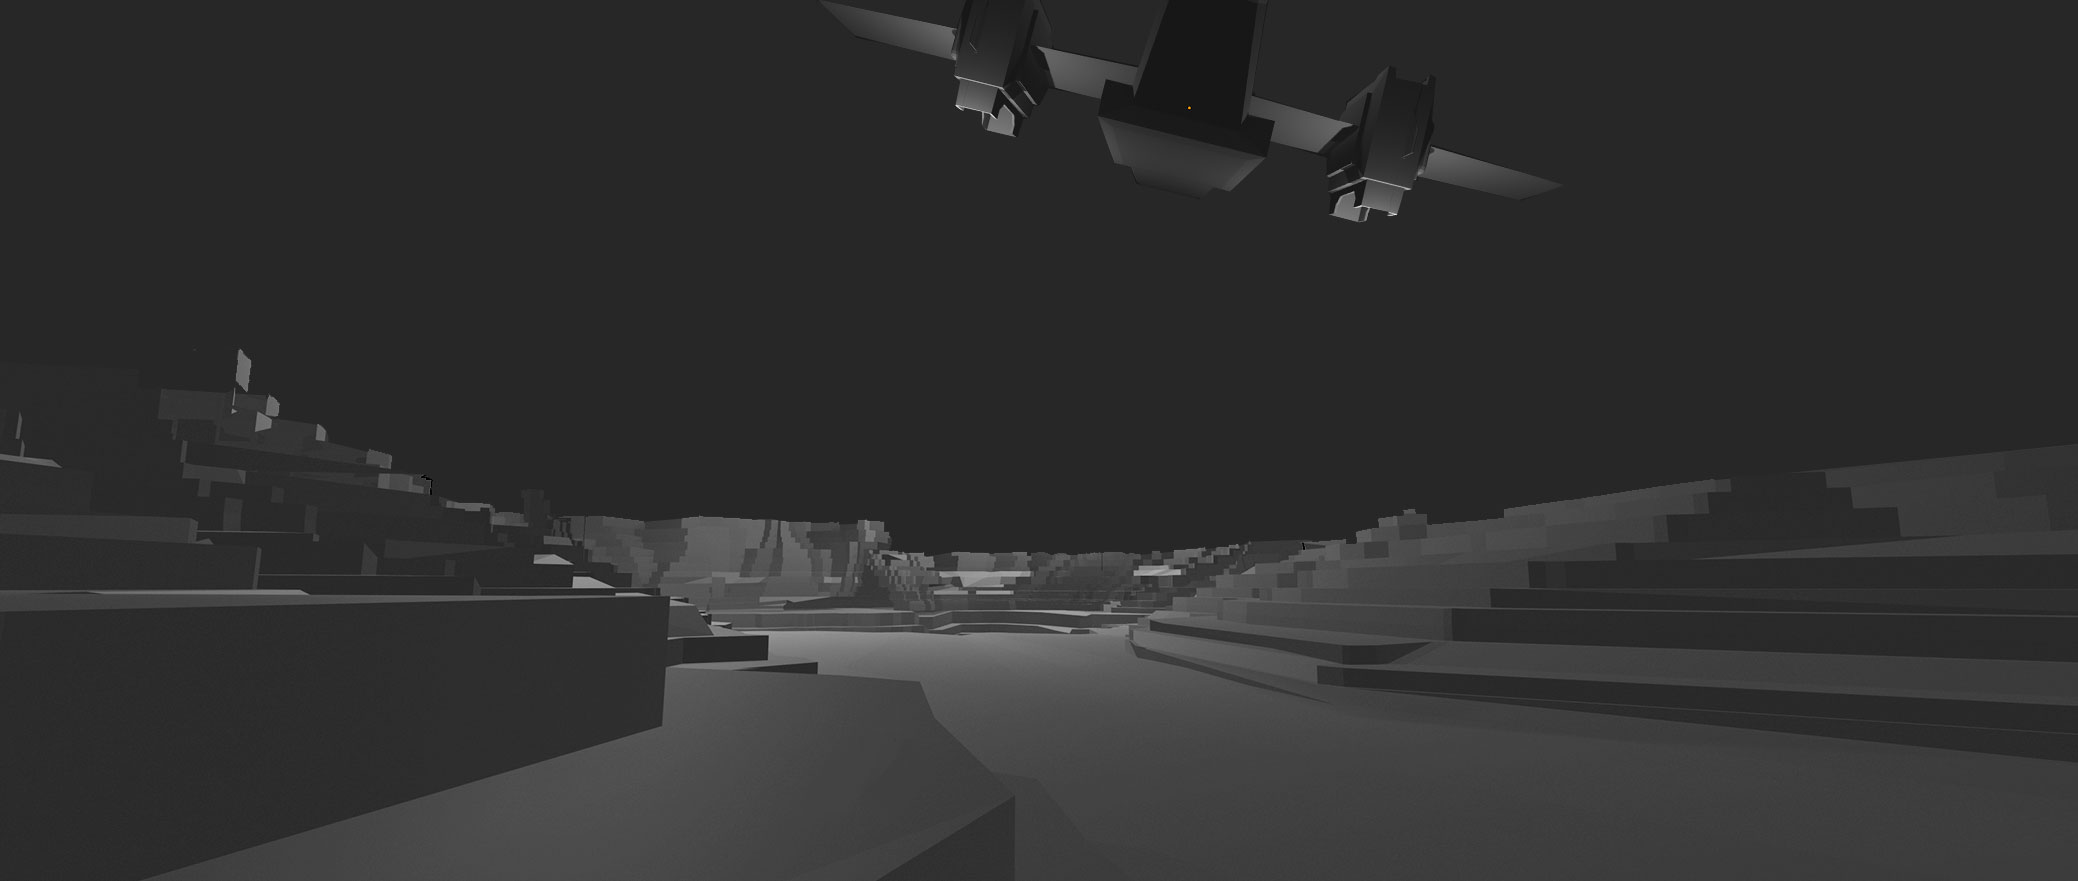 Wraiths_2019Animatic_Thumbsheet-02_38.jpg